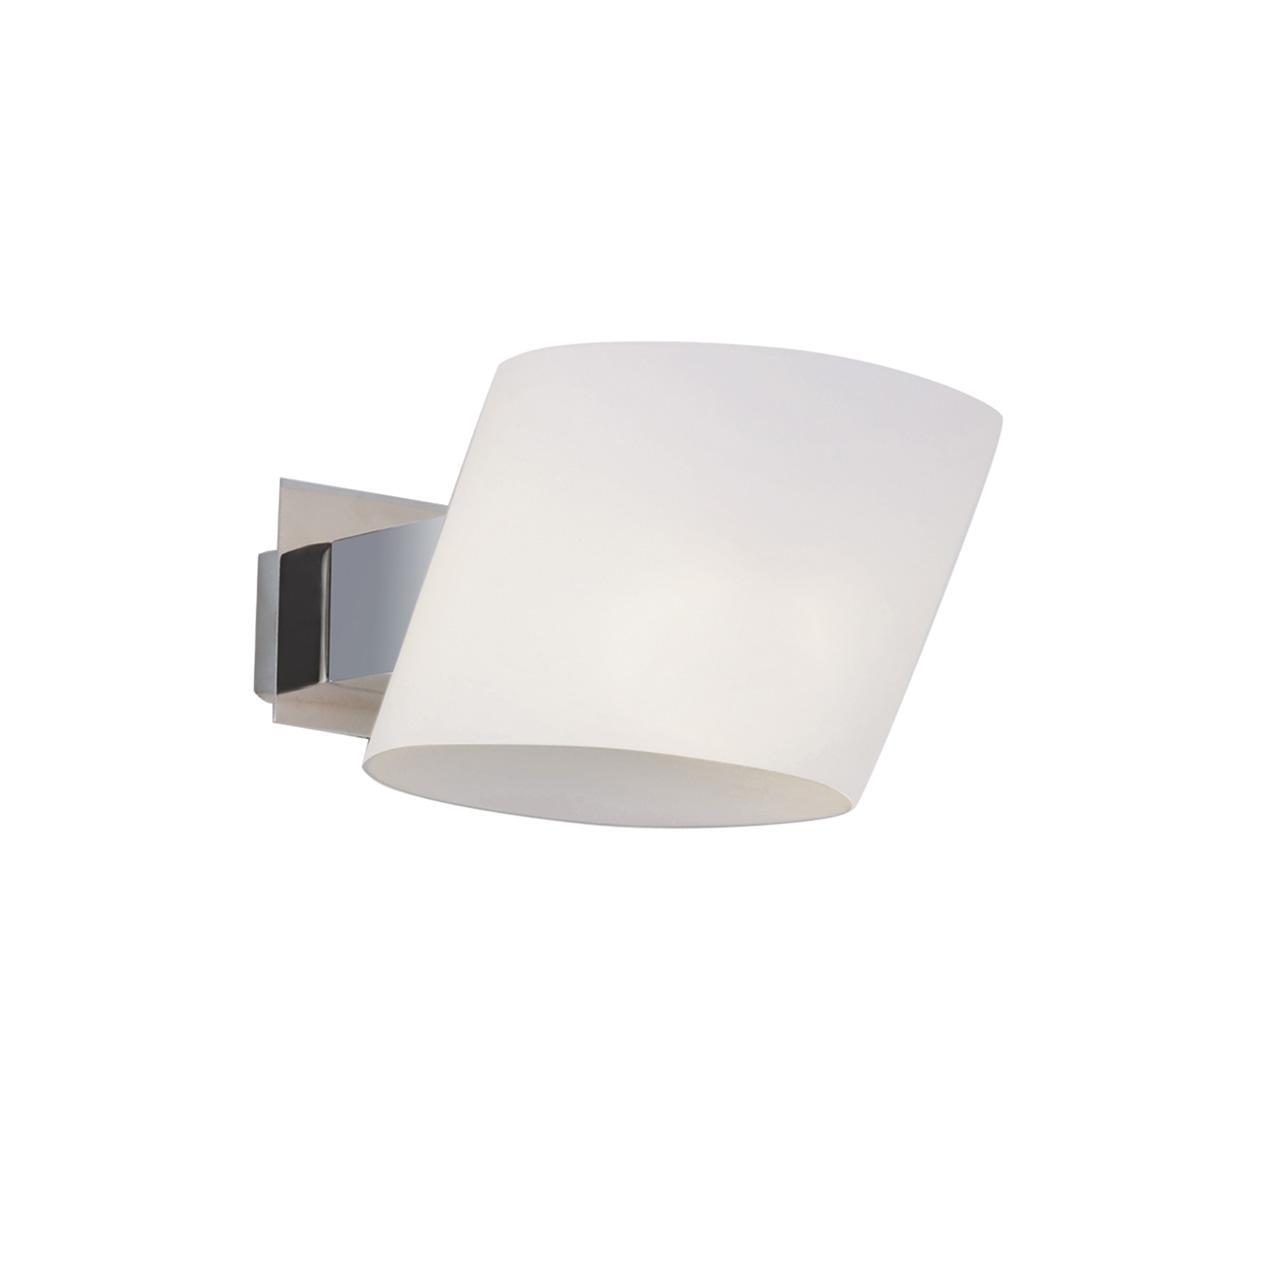 лучшая цена Бра Lightstar Dissimo 803610